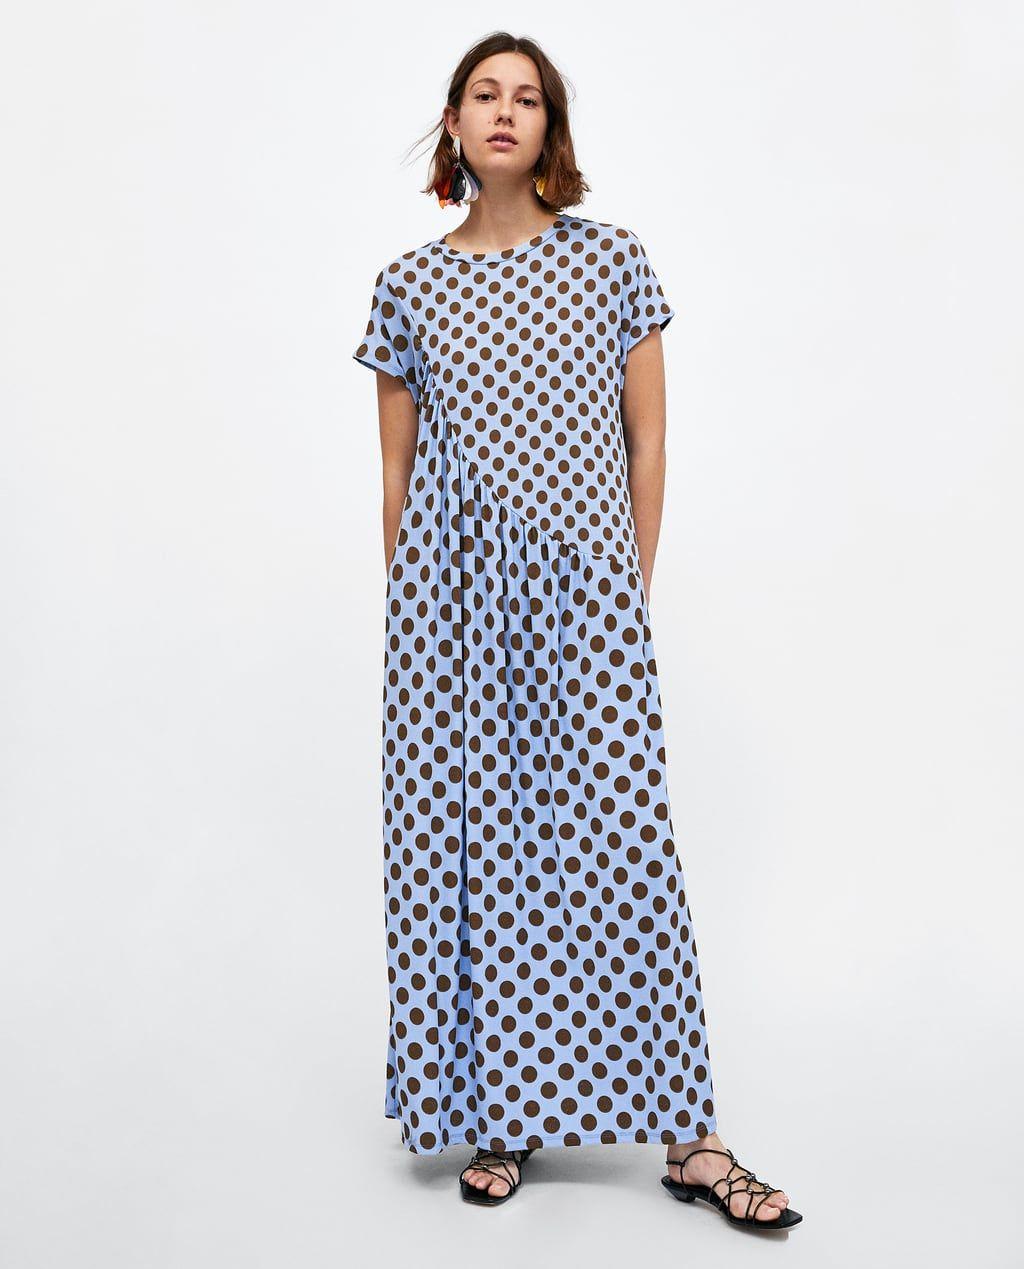 40a2e8aad Image 1 of GATHERED POLKA DOT DRESS from Zara Polka Dot T Shirts